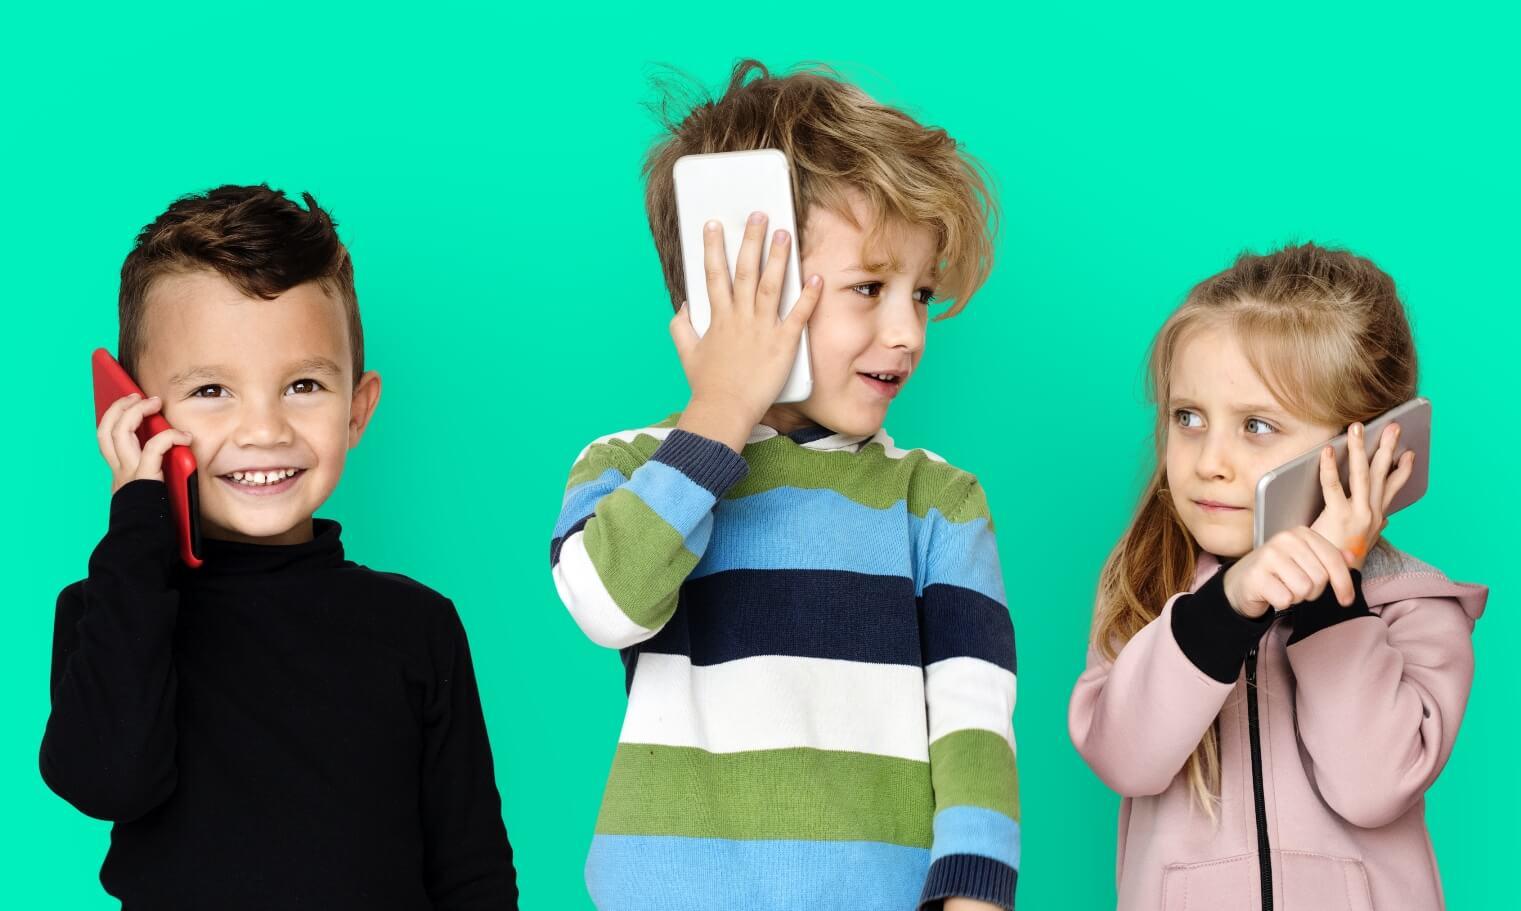 Фото ребёнка с телефоном в руках